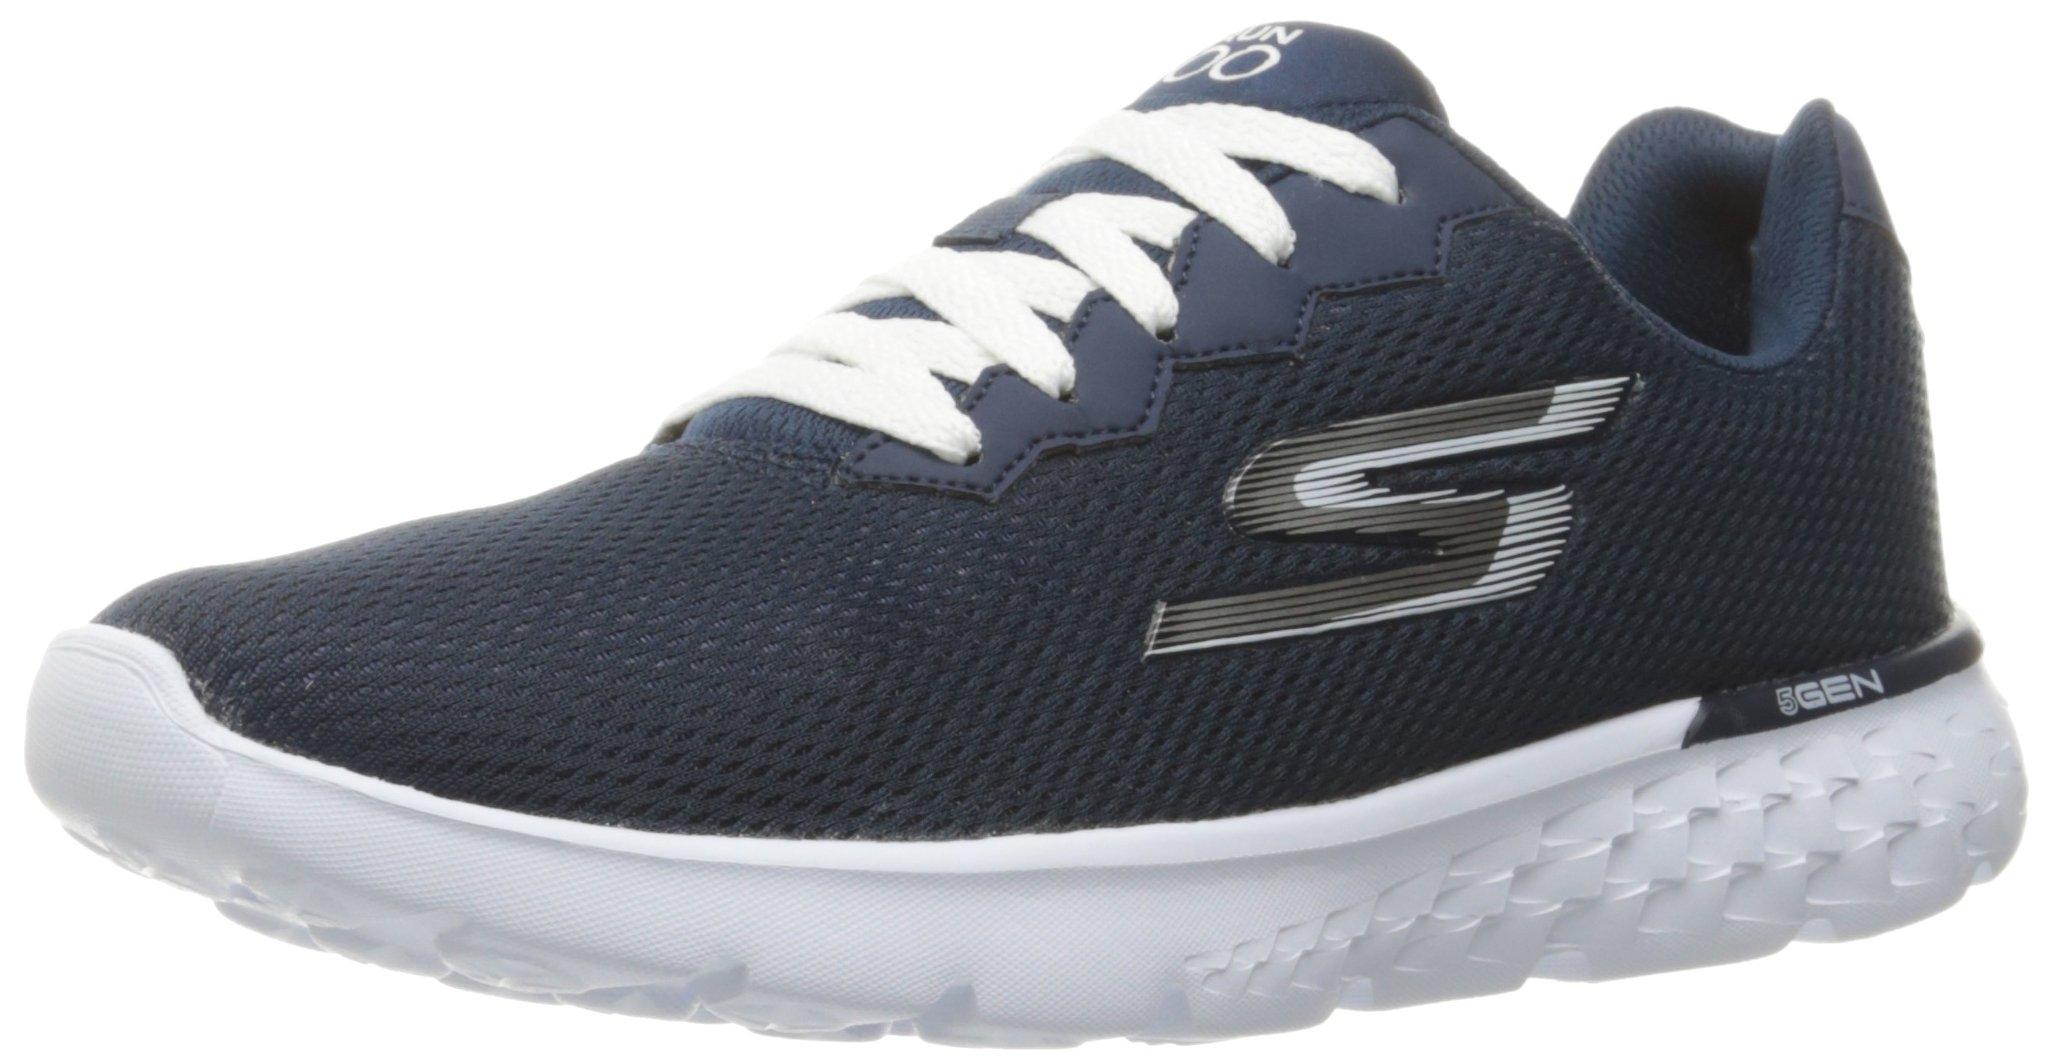 Run ActionShoes Skechers Eu Go 400 FemmeBleunvw37 dErQBoeCxW